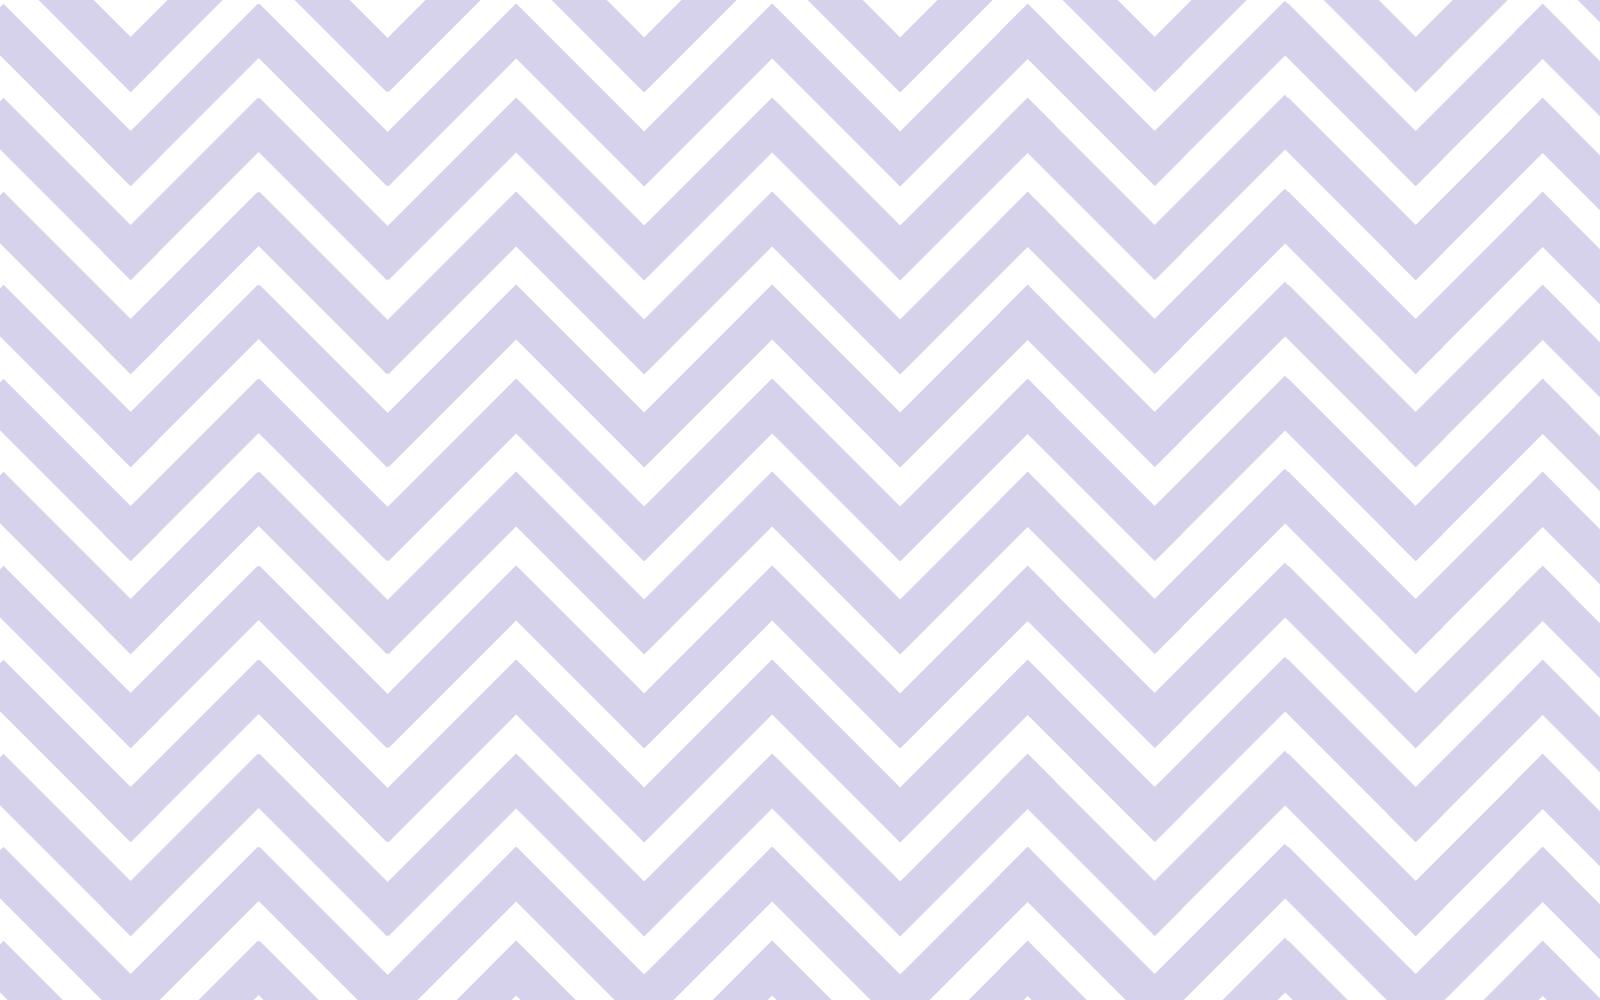 Free Chevron Backgrounds Purple Chevron Wallpaper Chevron Iphone Wallpaper Chevron Pattern Wallpaper